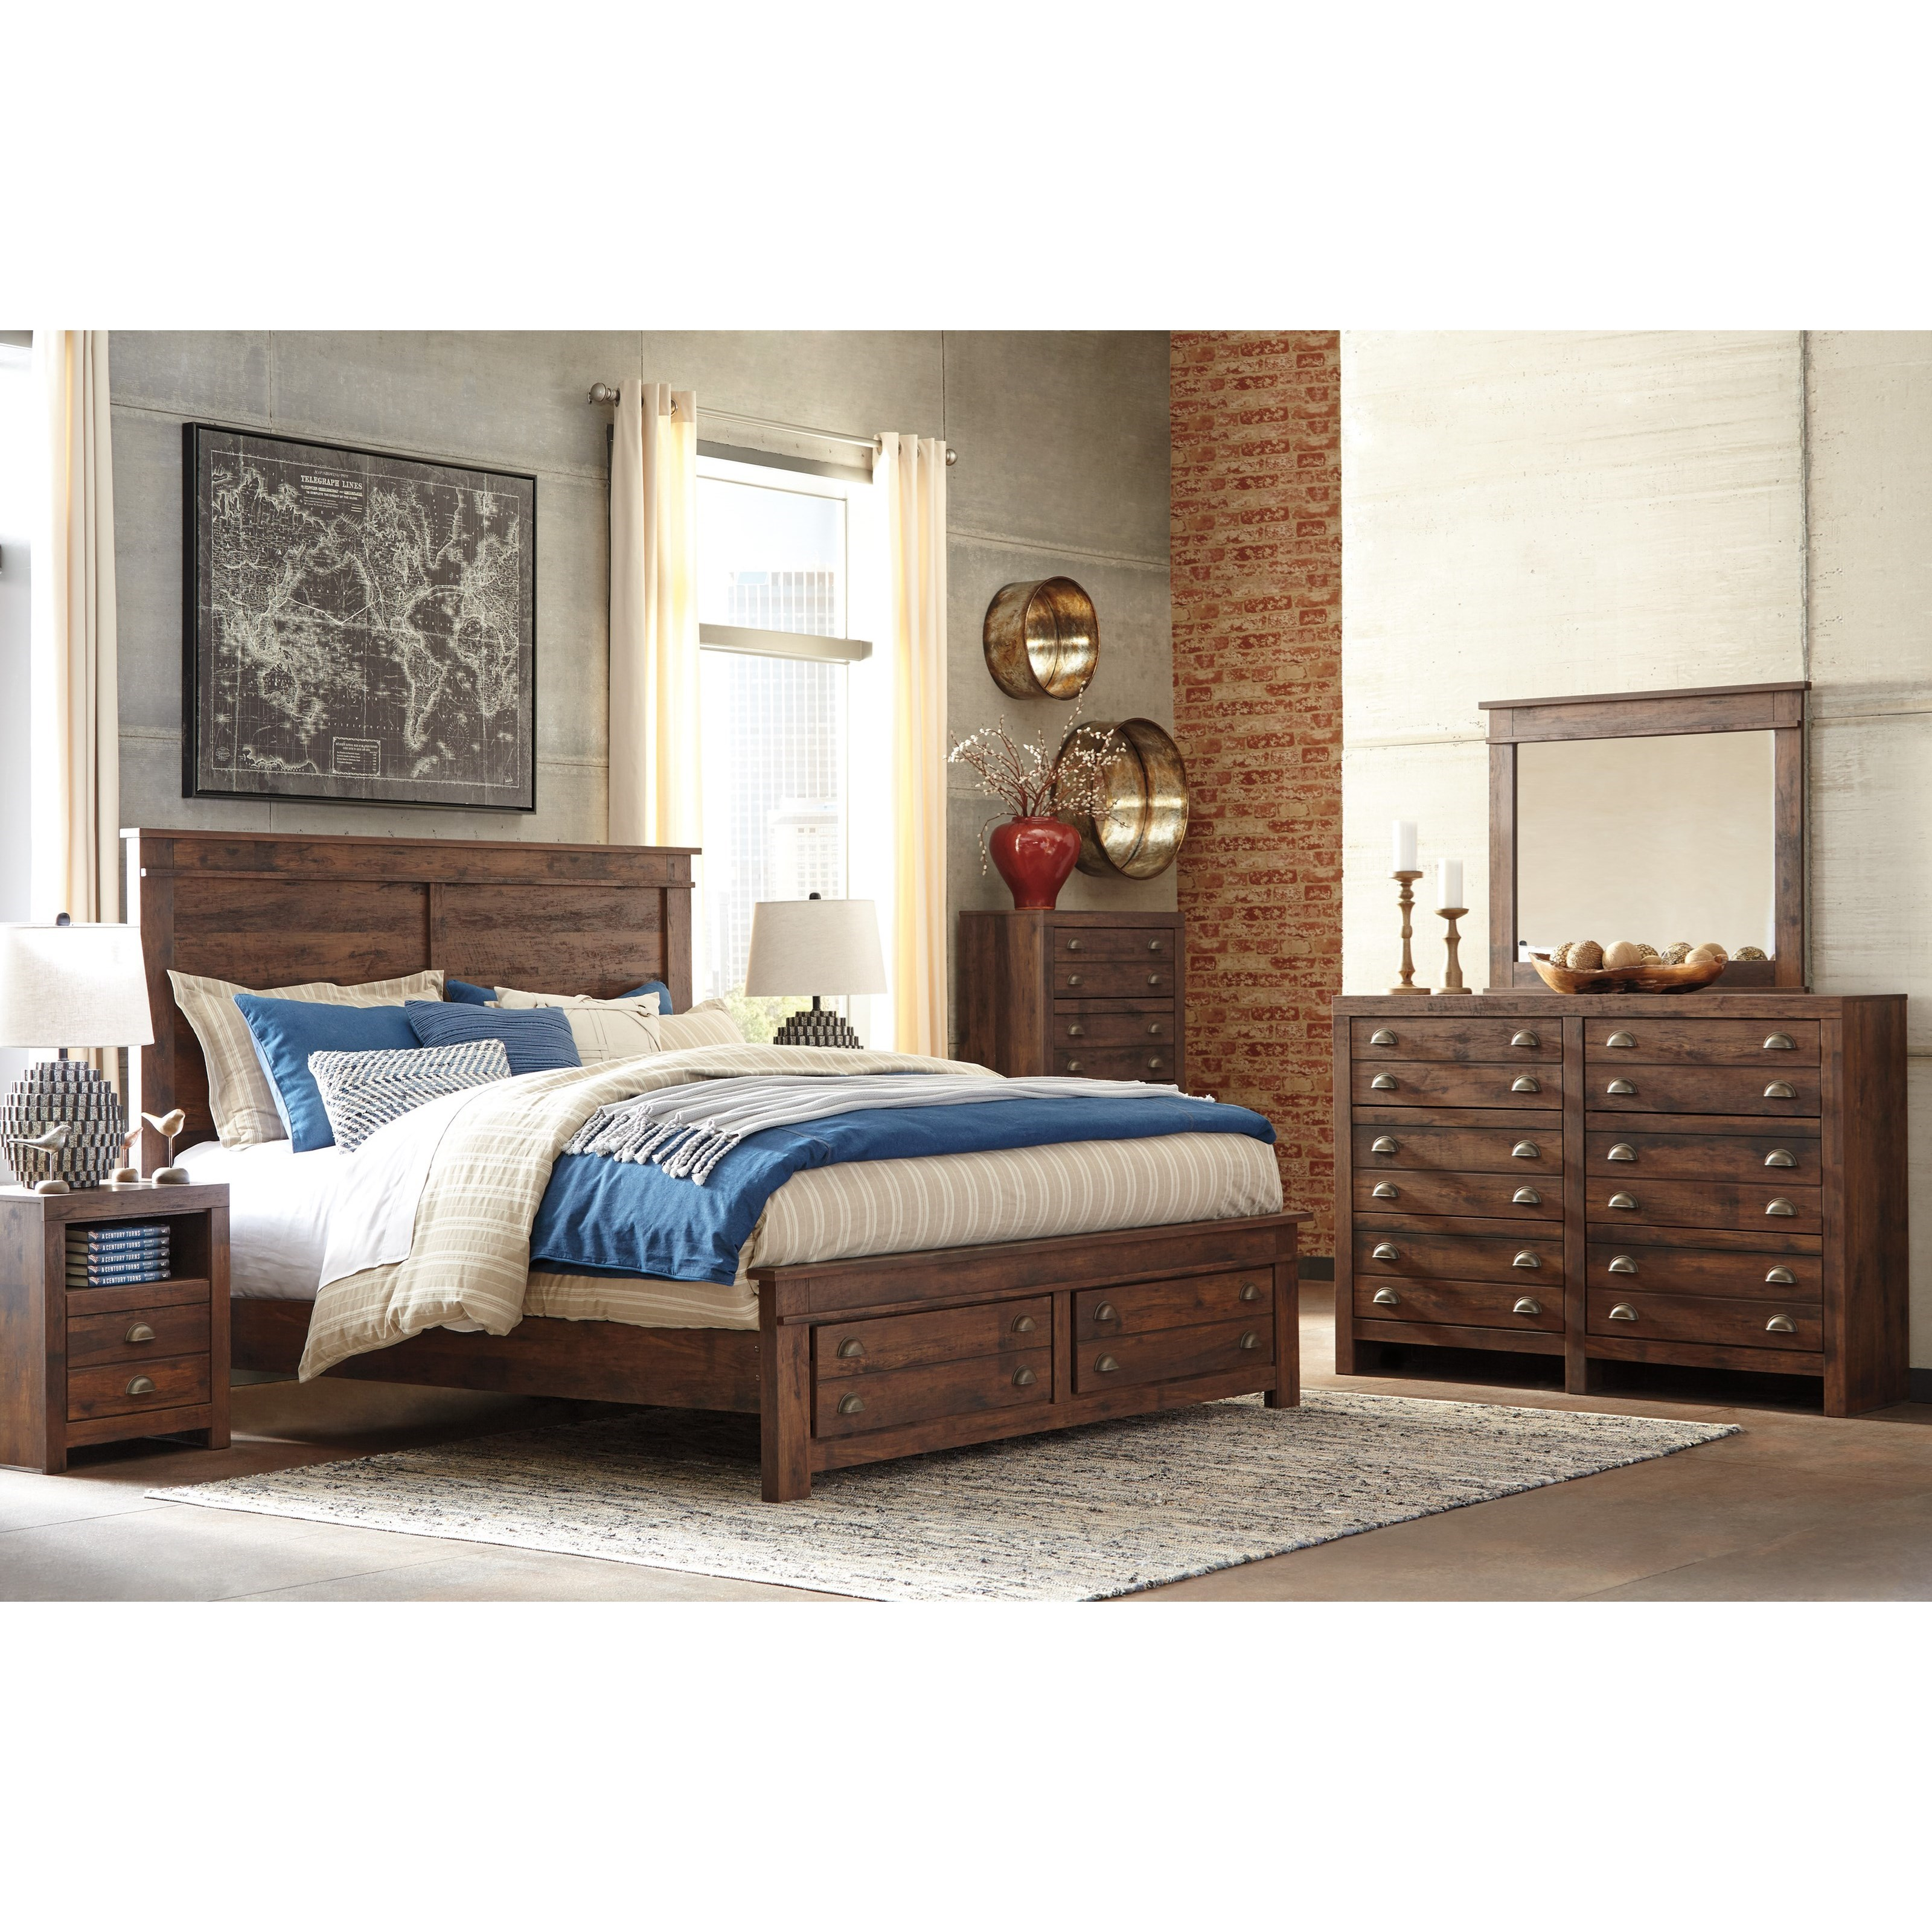 Signature Design by Ashley Hammerstead King Bedroom Group - Item Number: B407 K Bedroom Group 4